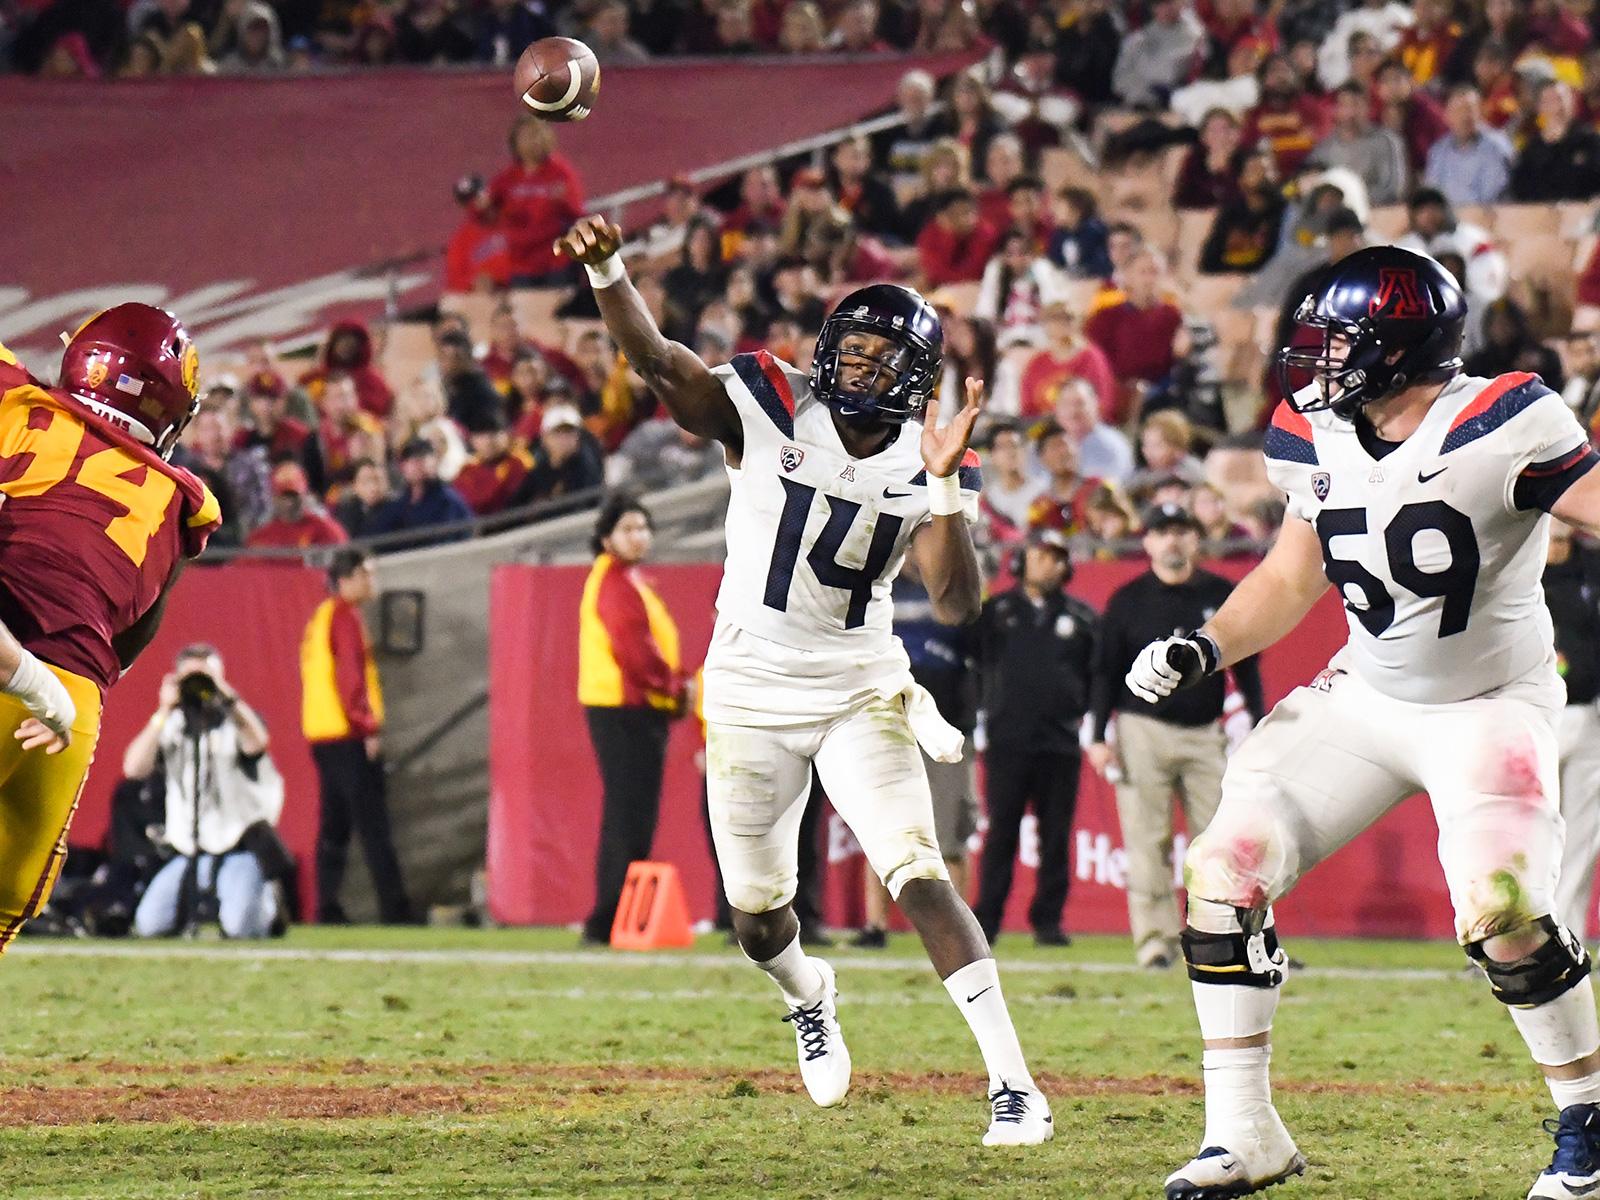 COLLEGE FOOTBALL: NOV 04 Arizona at USC